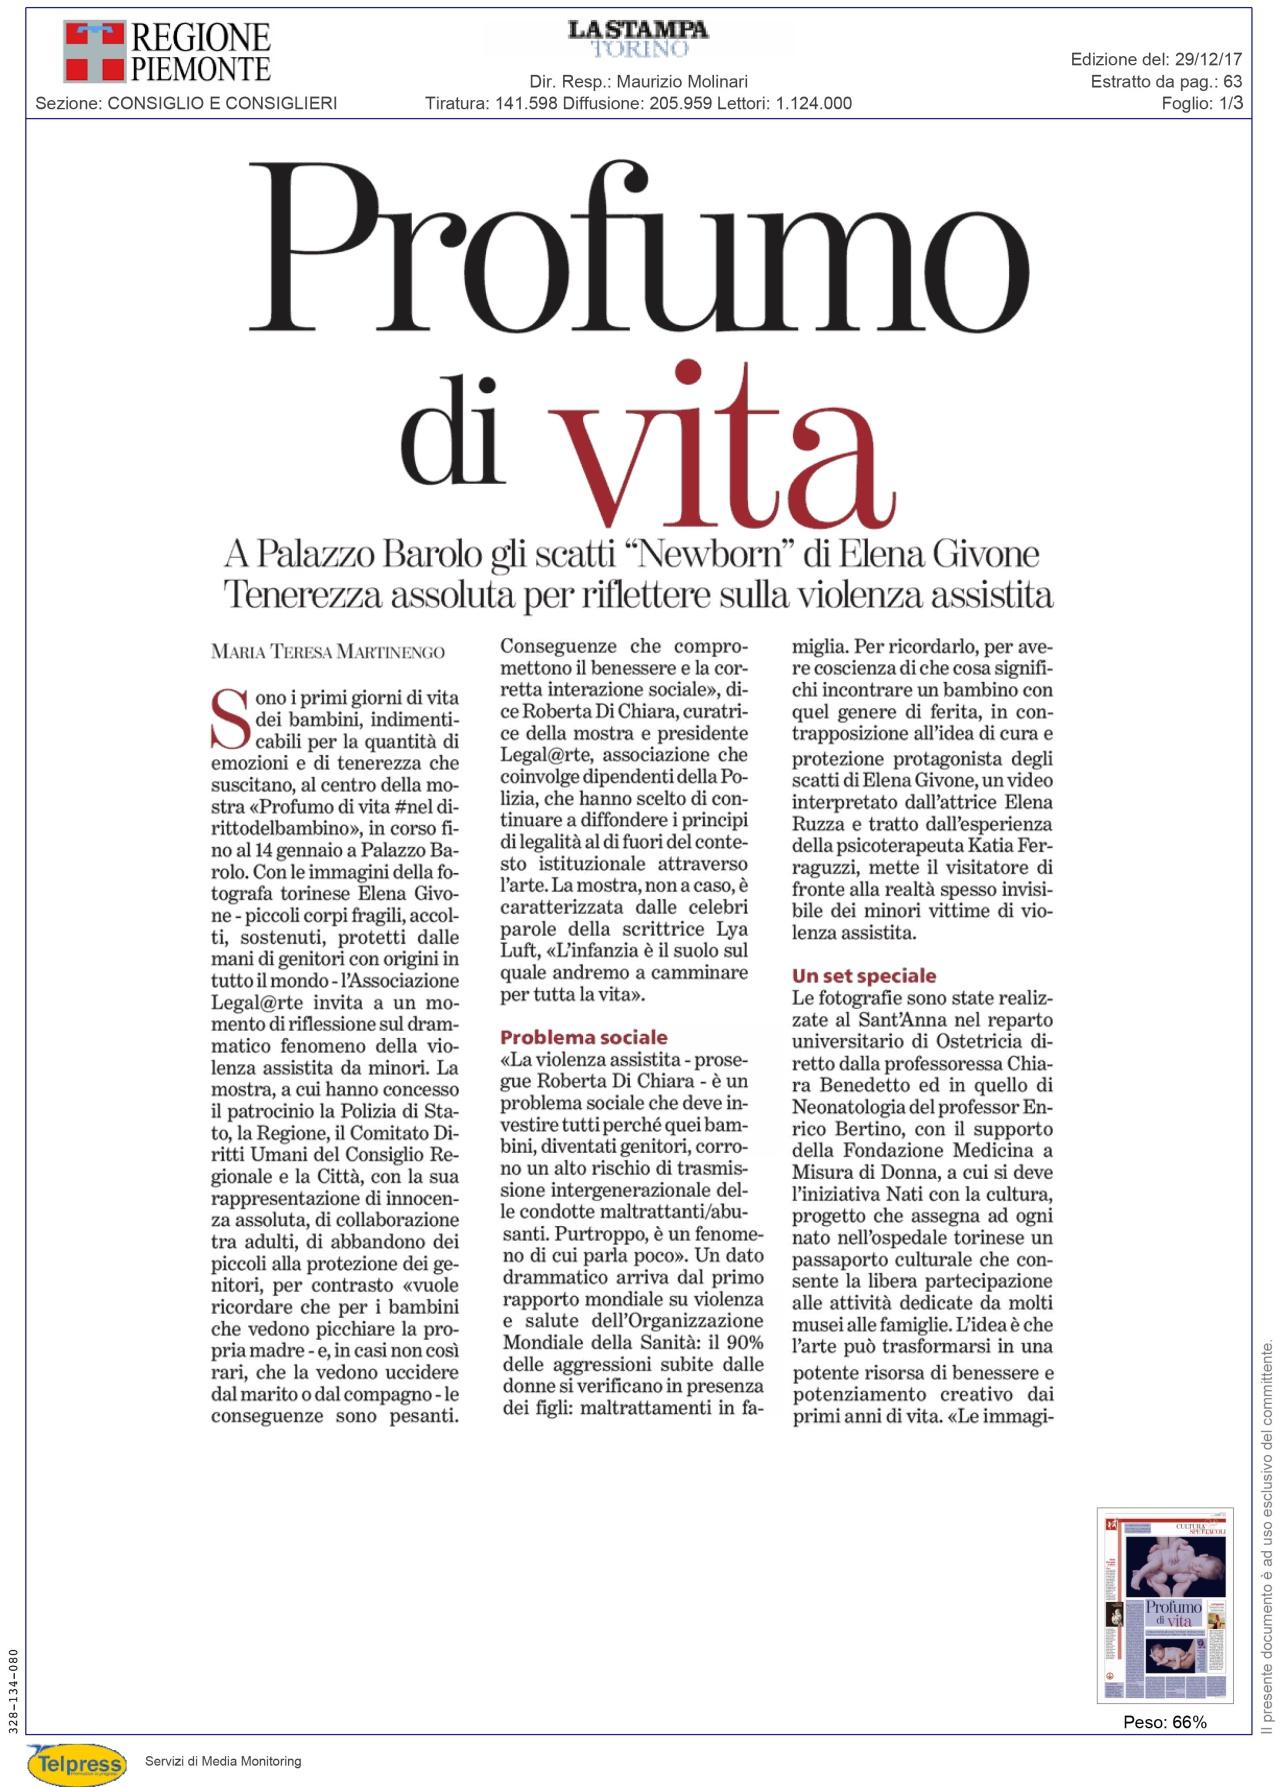 La_stampa_TO_Profumo_di_vita_29.12.17_1.jpg